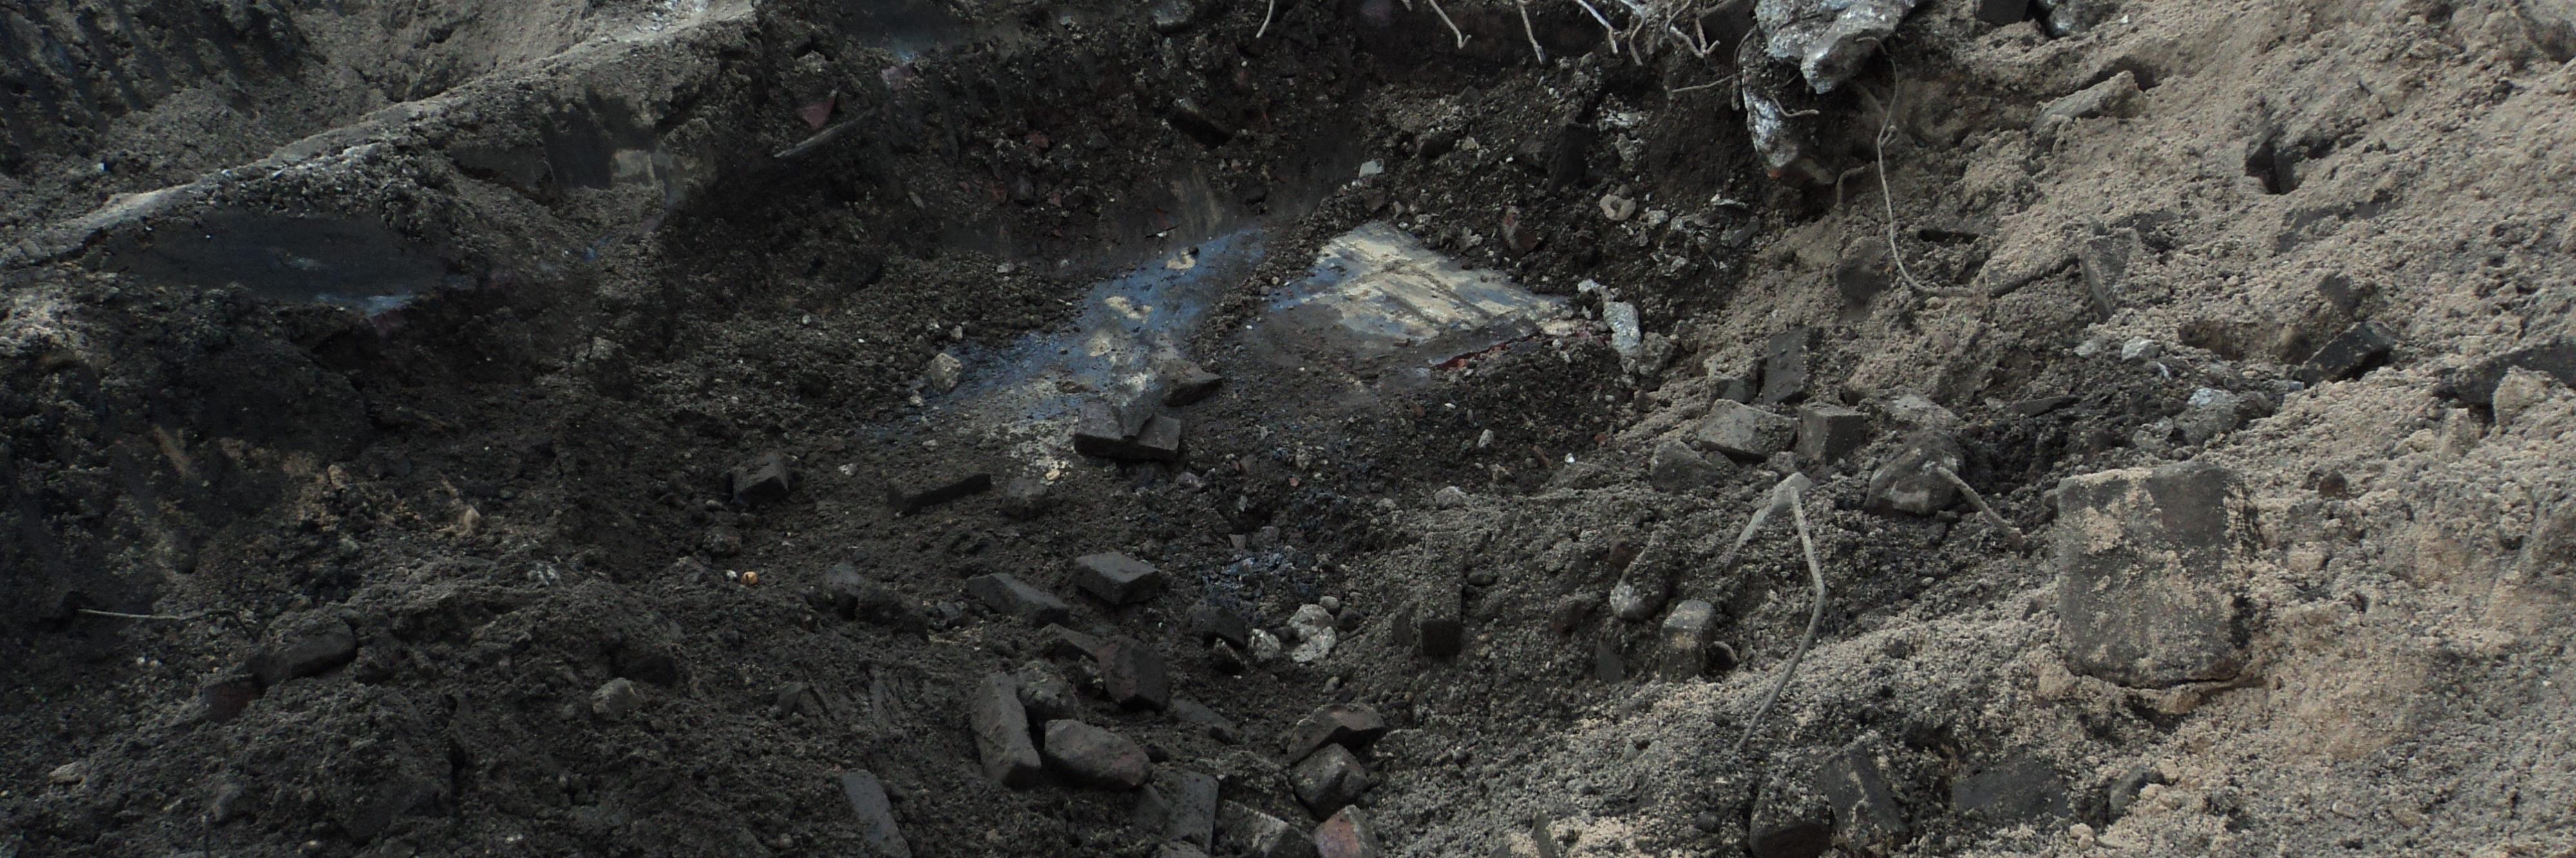 Vervuilde grond